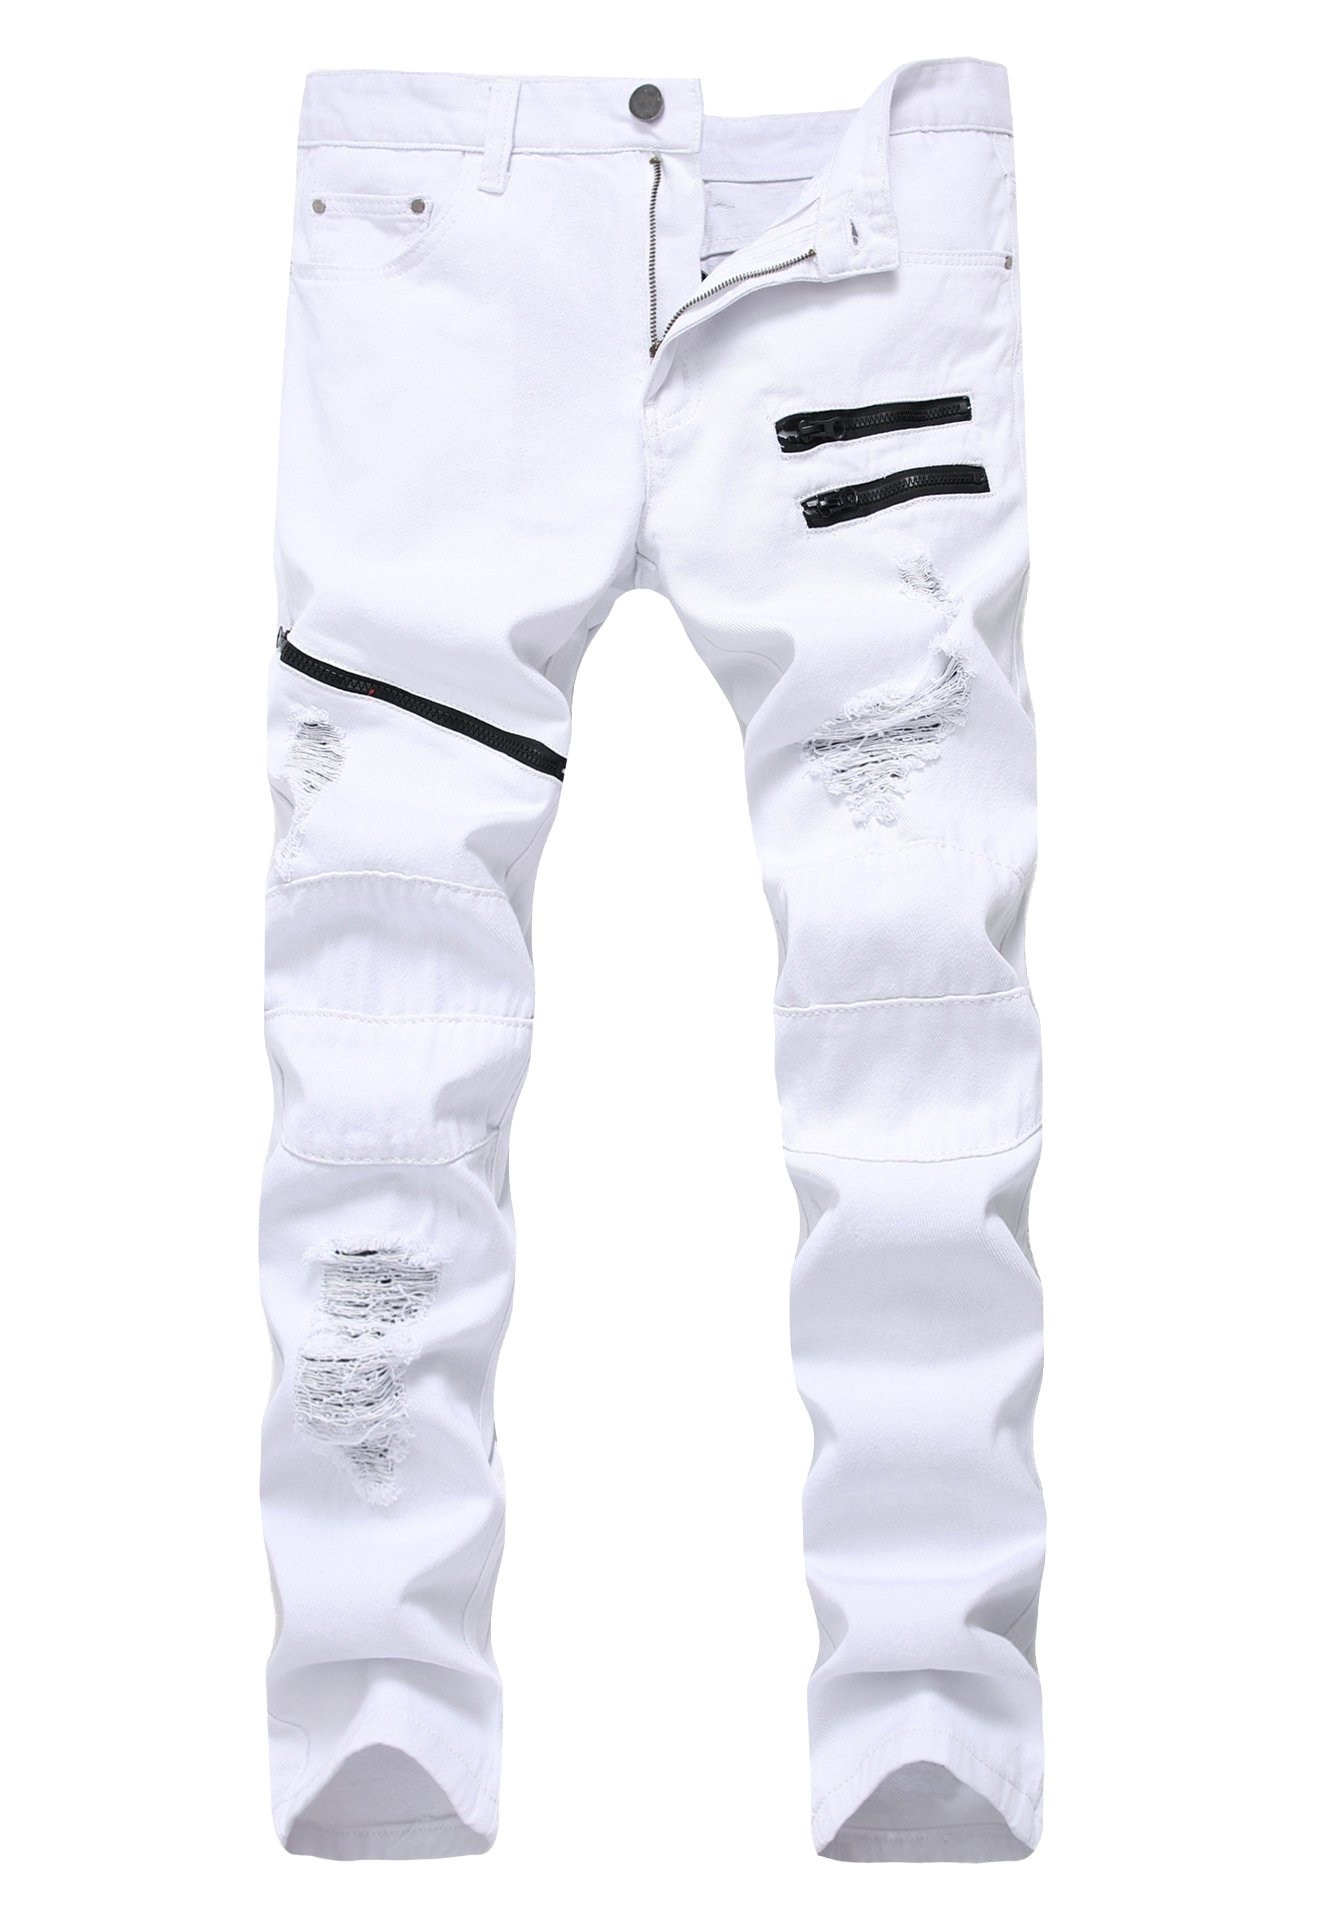 LAMCORD Men's Zipper Destroyed Ripped Skinny Slim Fit Stretch Holes Denim Jeans, White, W30